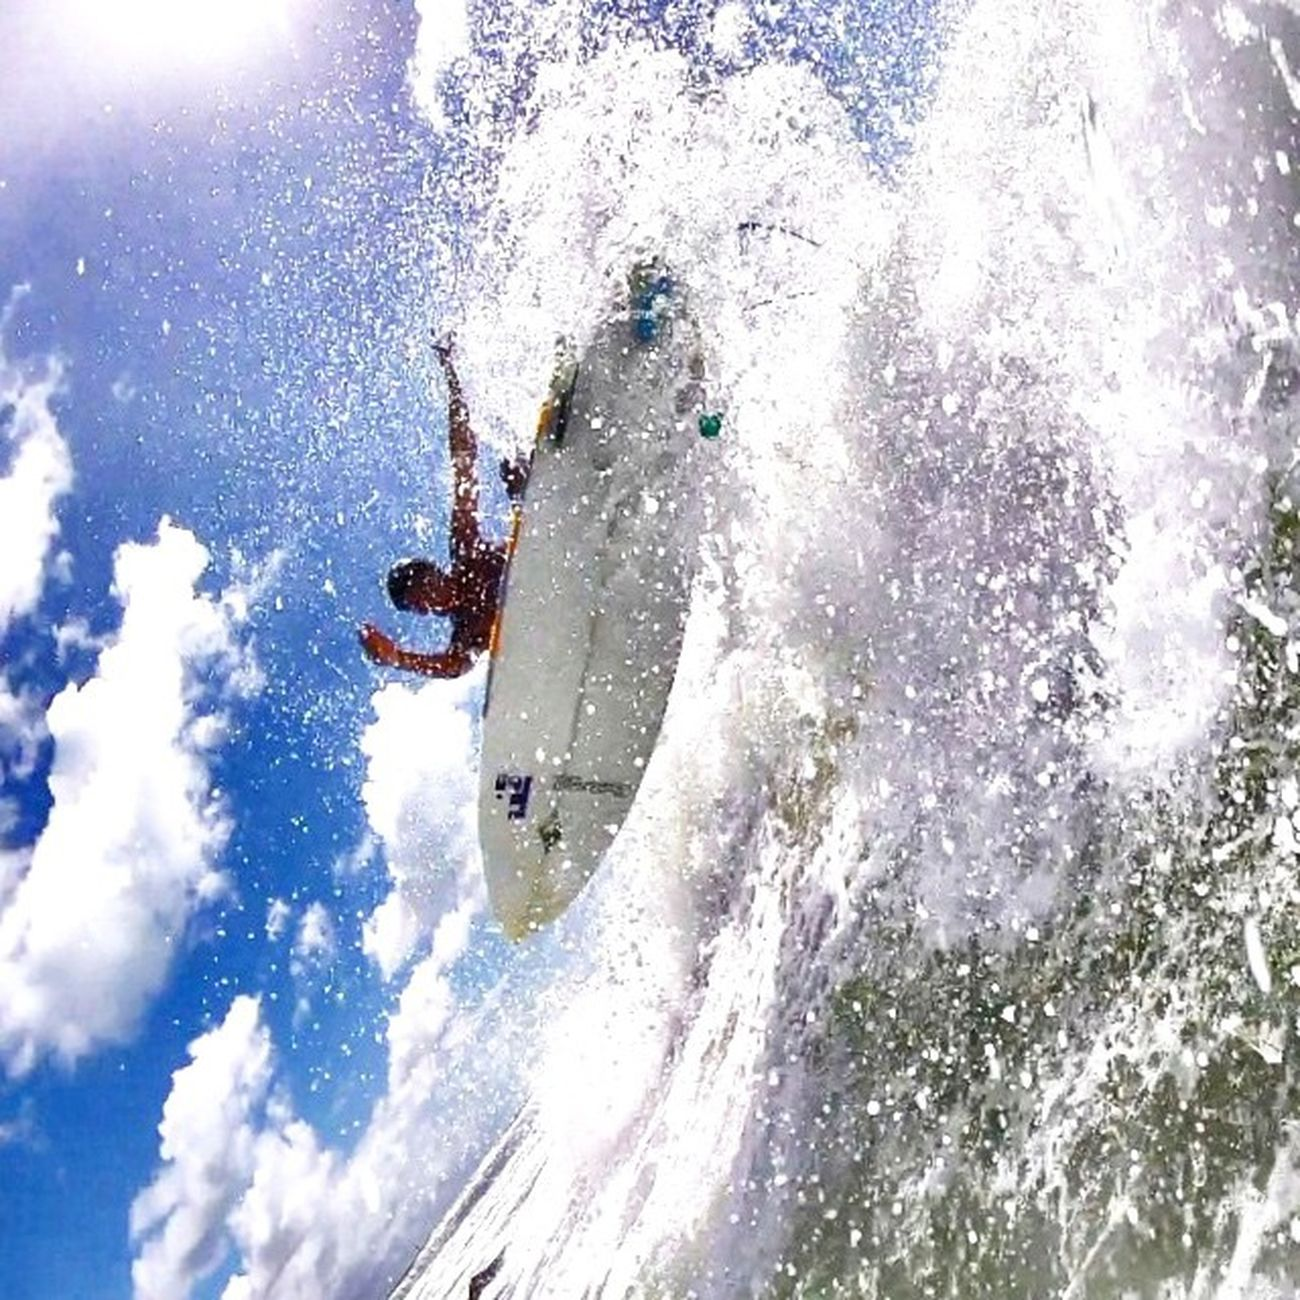 Liberte sua mente!🌊🏄🙌⛅️☔️ Allallauu via @lifeapp Surferphotos SURFINGfactory StillCommunication Surfingiseverything Watermansguild Raynorsurf Truetothis Onmylist Ondaperfeita Perfectwave Almondsurfboards Athome  Artlover Cihigh5 Viva LifeInStyle LiveTheSearch Aerialsurfing